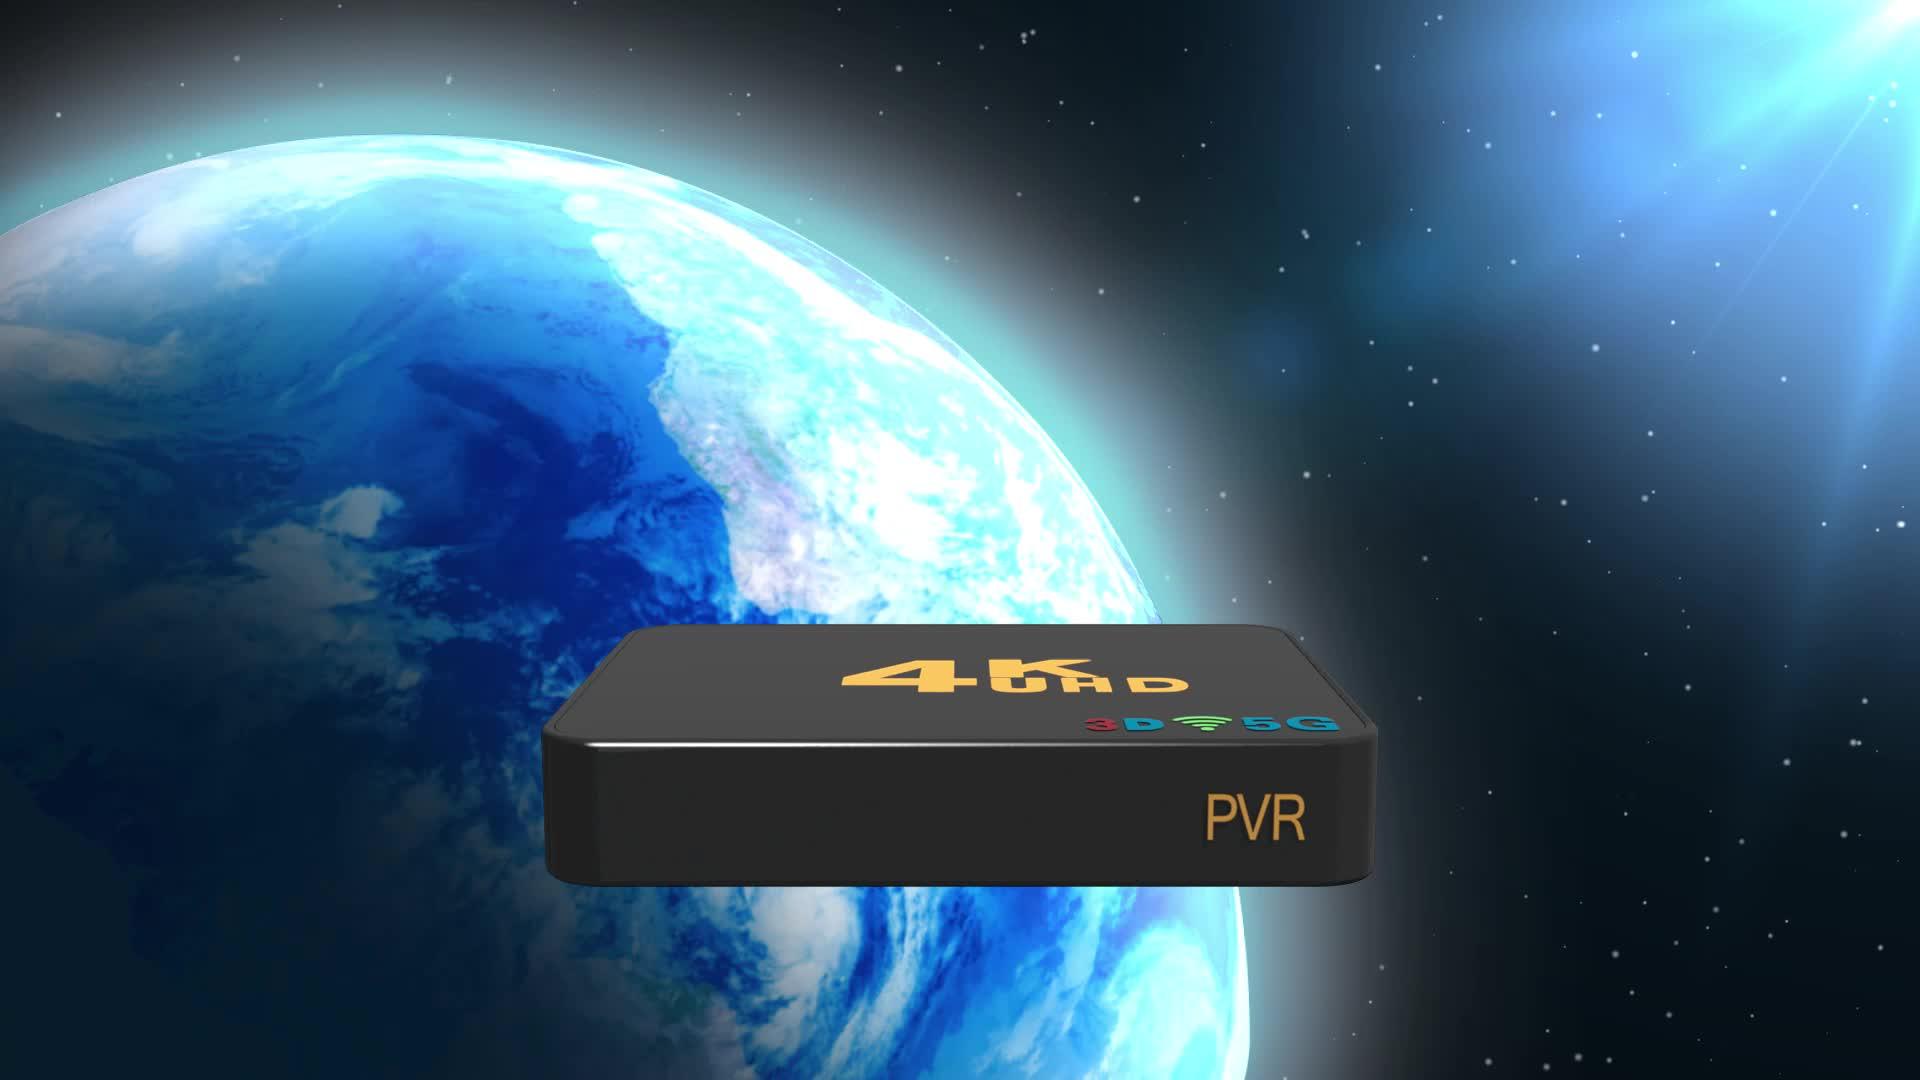 4k Uhd 3d 5g Wifi Pvr Kodi 17.3 Blue Film Full Sexy Movie Hd Video Download Iptv Set Top Box - Buy Full Sexy Hd Video Download.Blue Film Sex Video ...